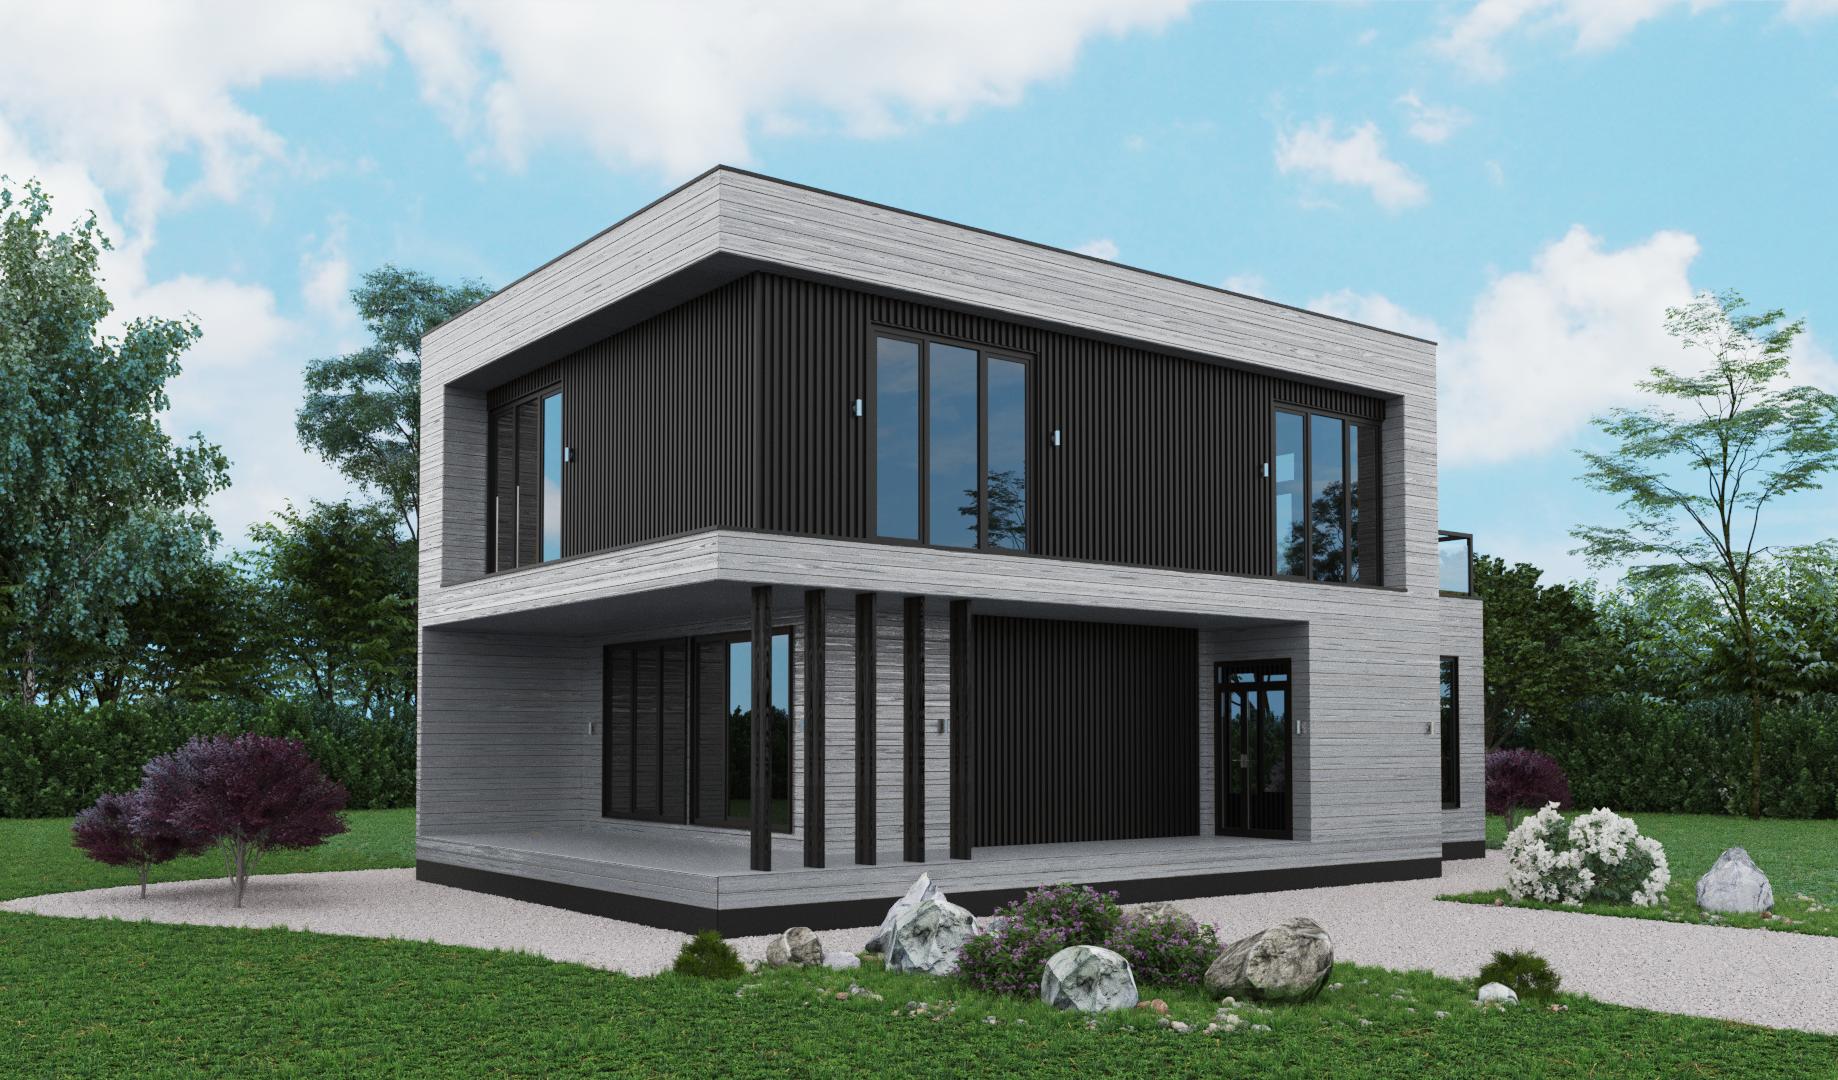 3 дом. Вид 1. Серый